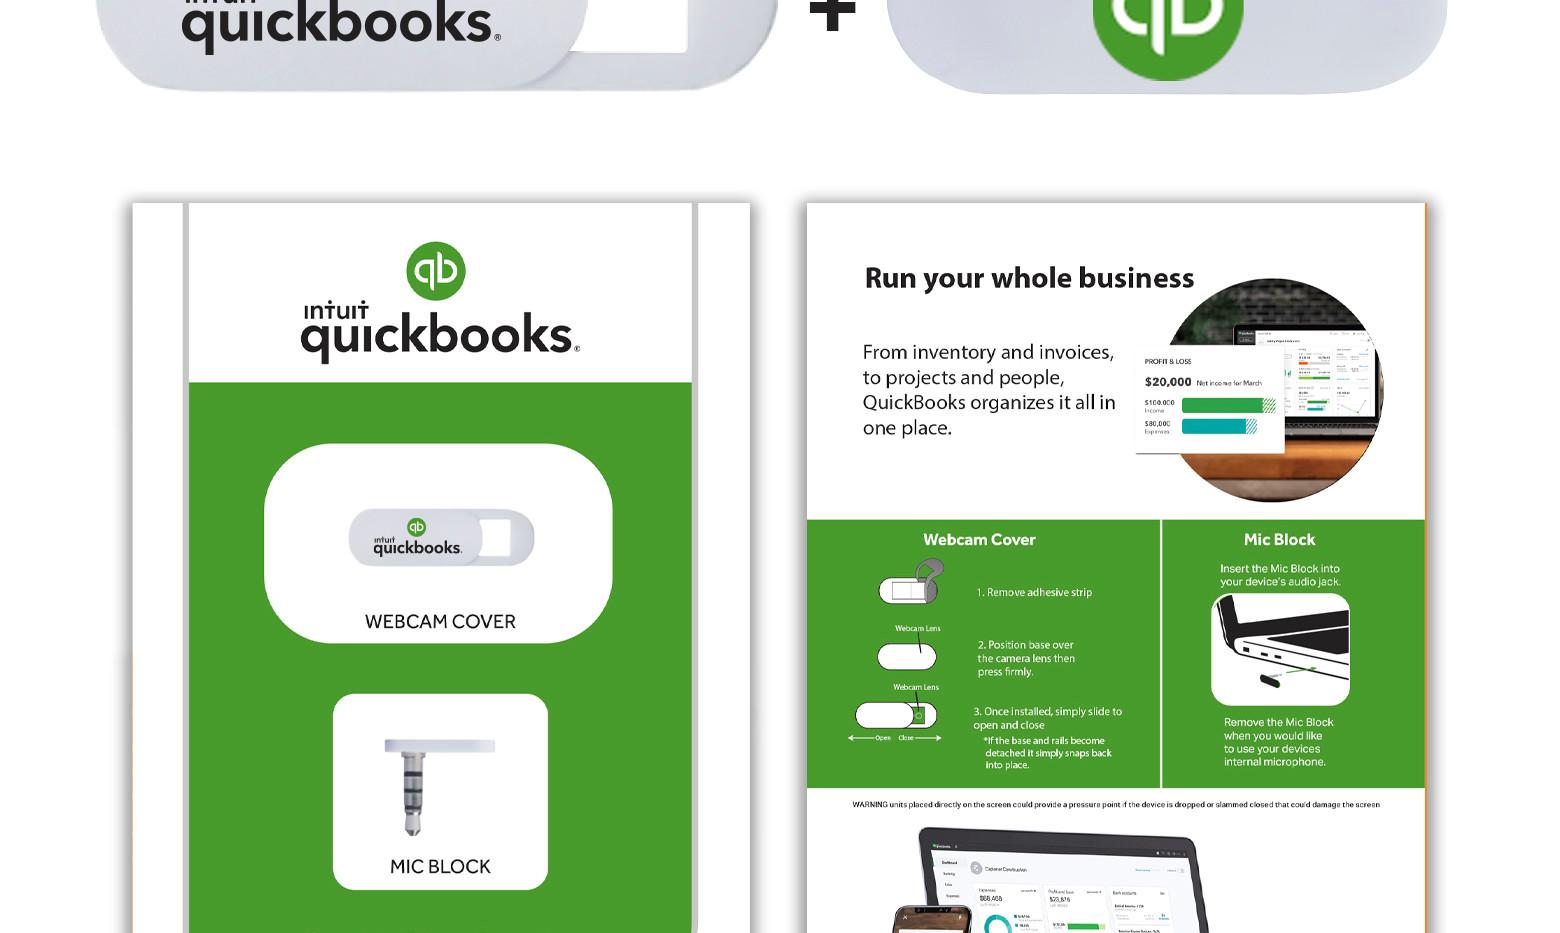 IntuitQuickbooks See no Hear No custom r